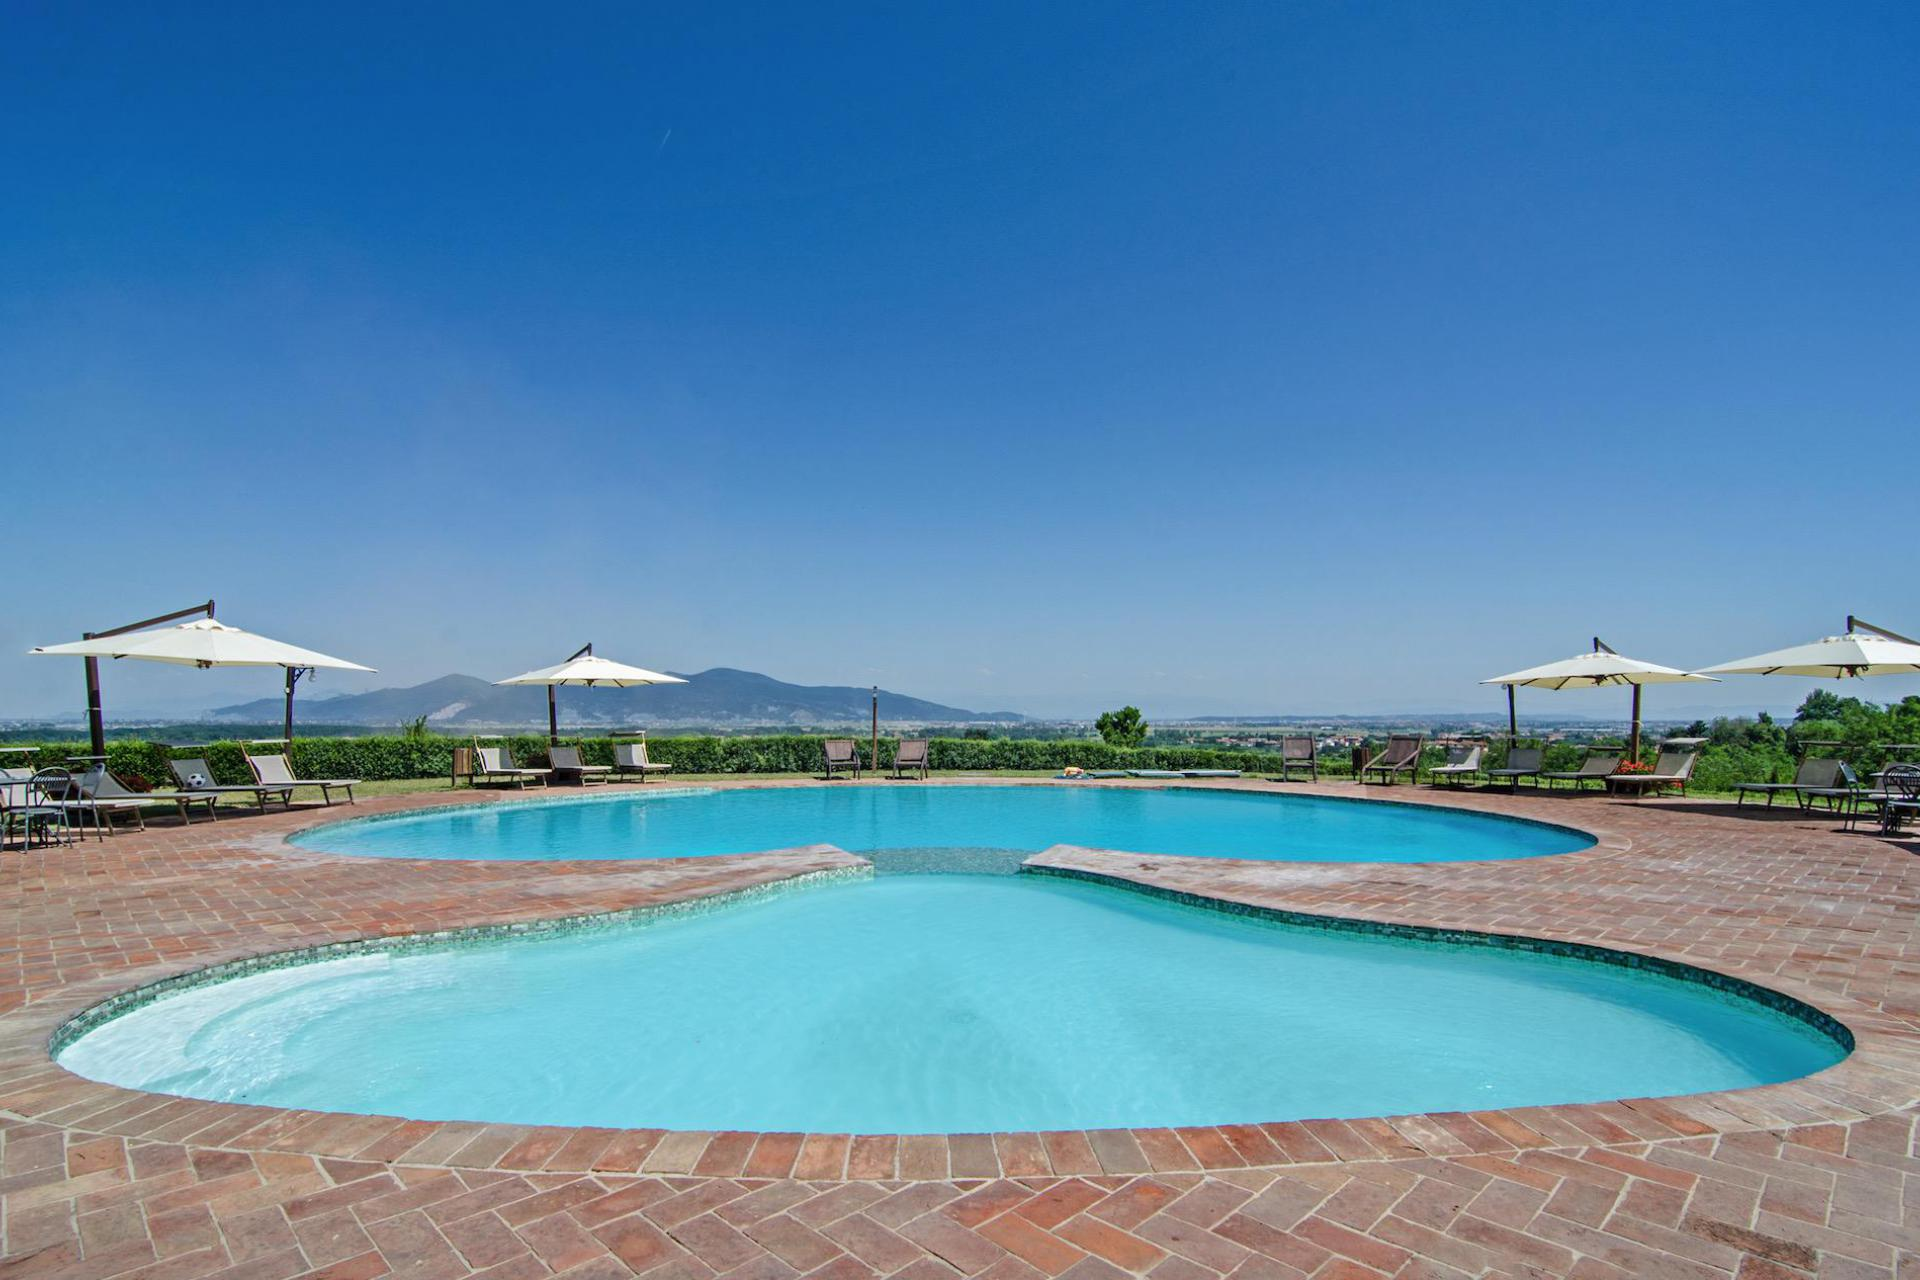 Agriturismo Toscane Agriturismo met panoramisch zwembad in Toscane | myitaly.nl